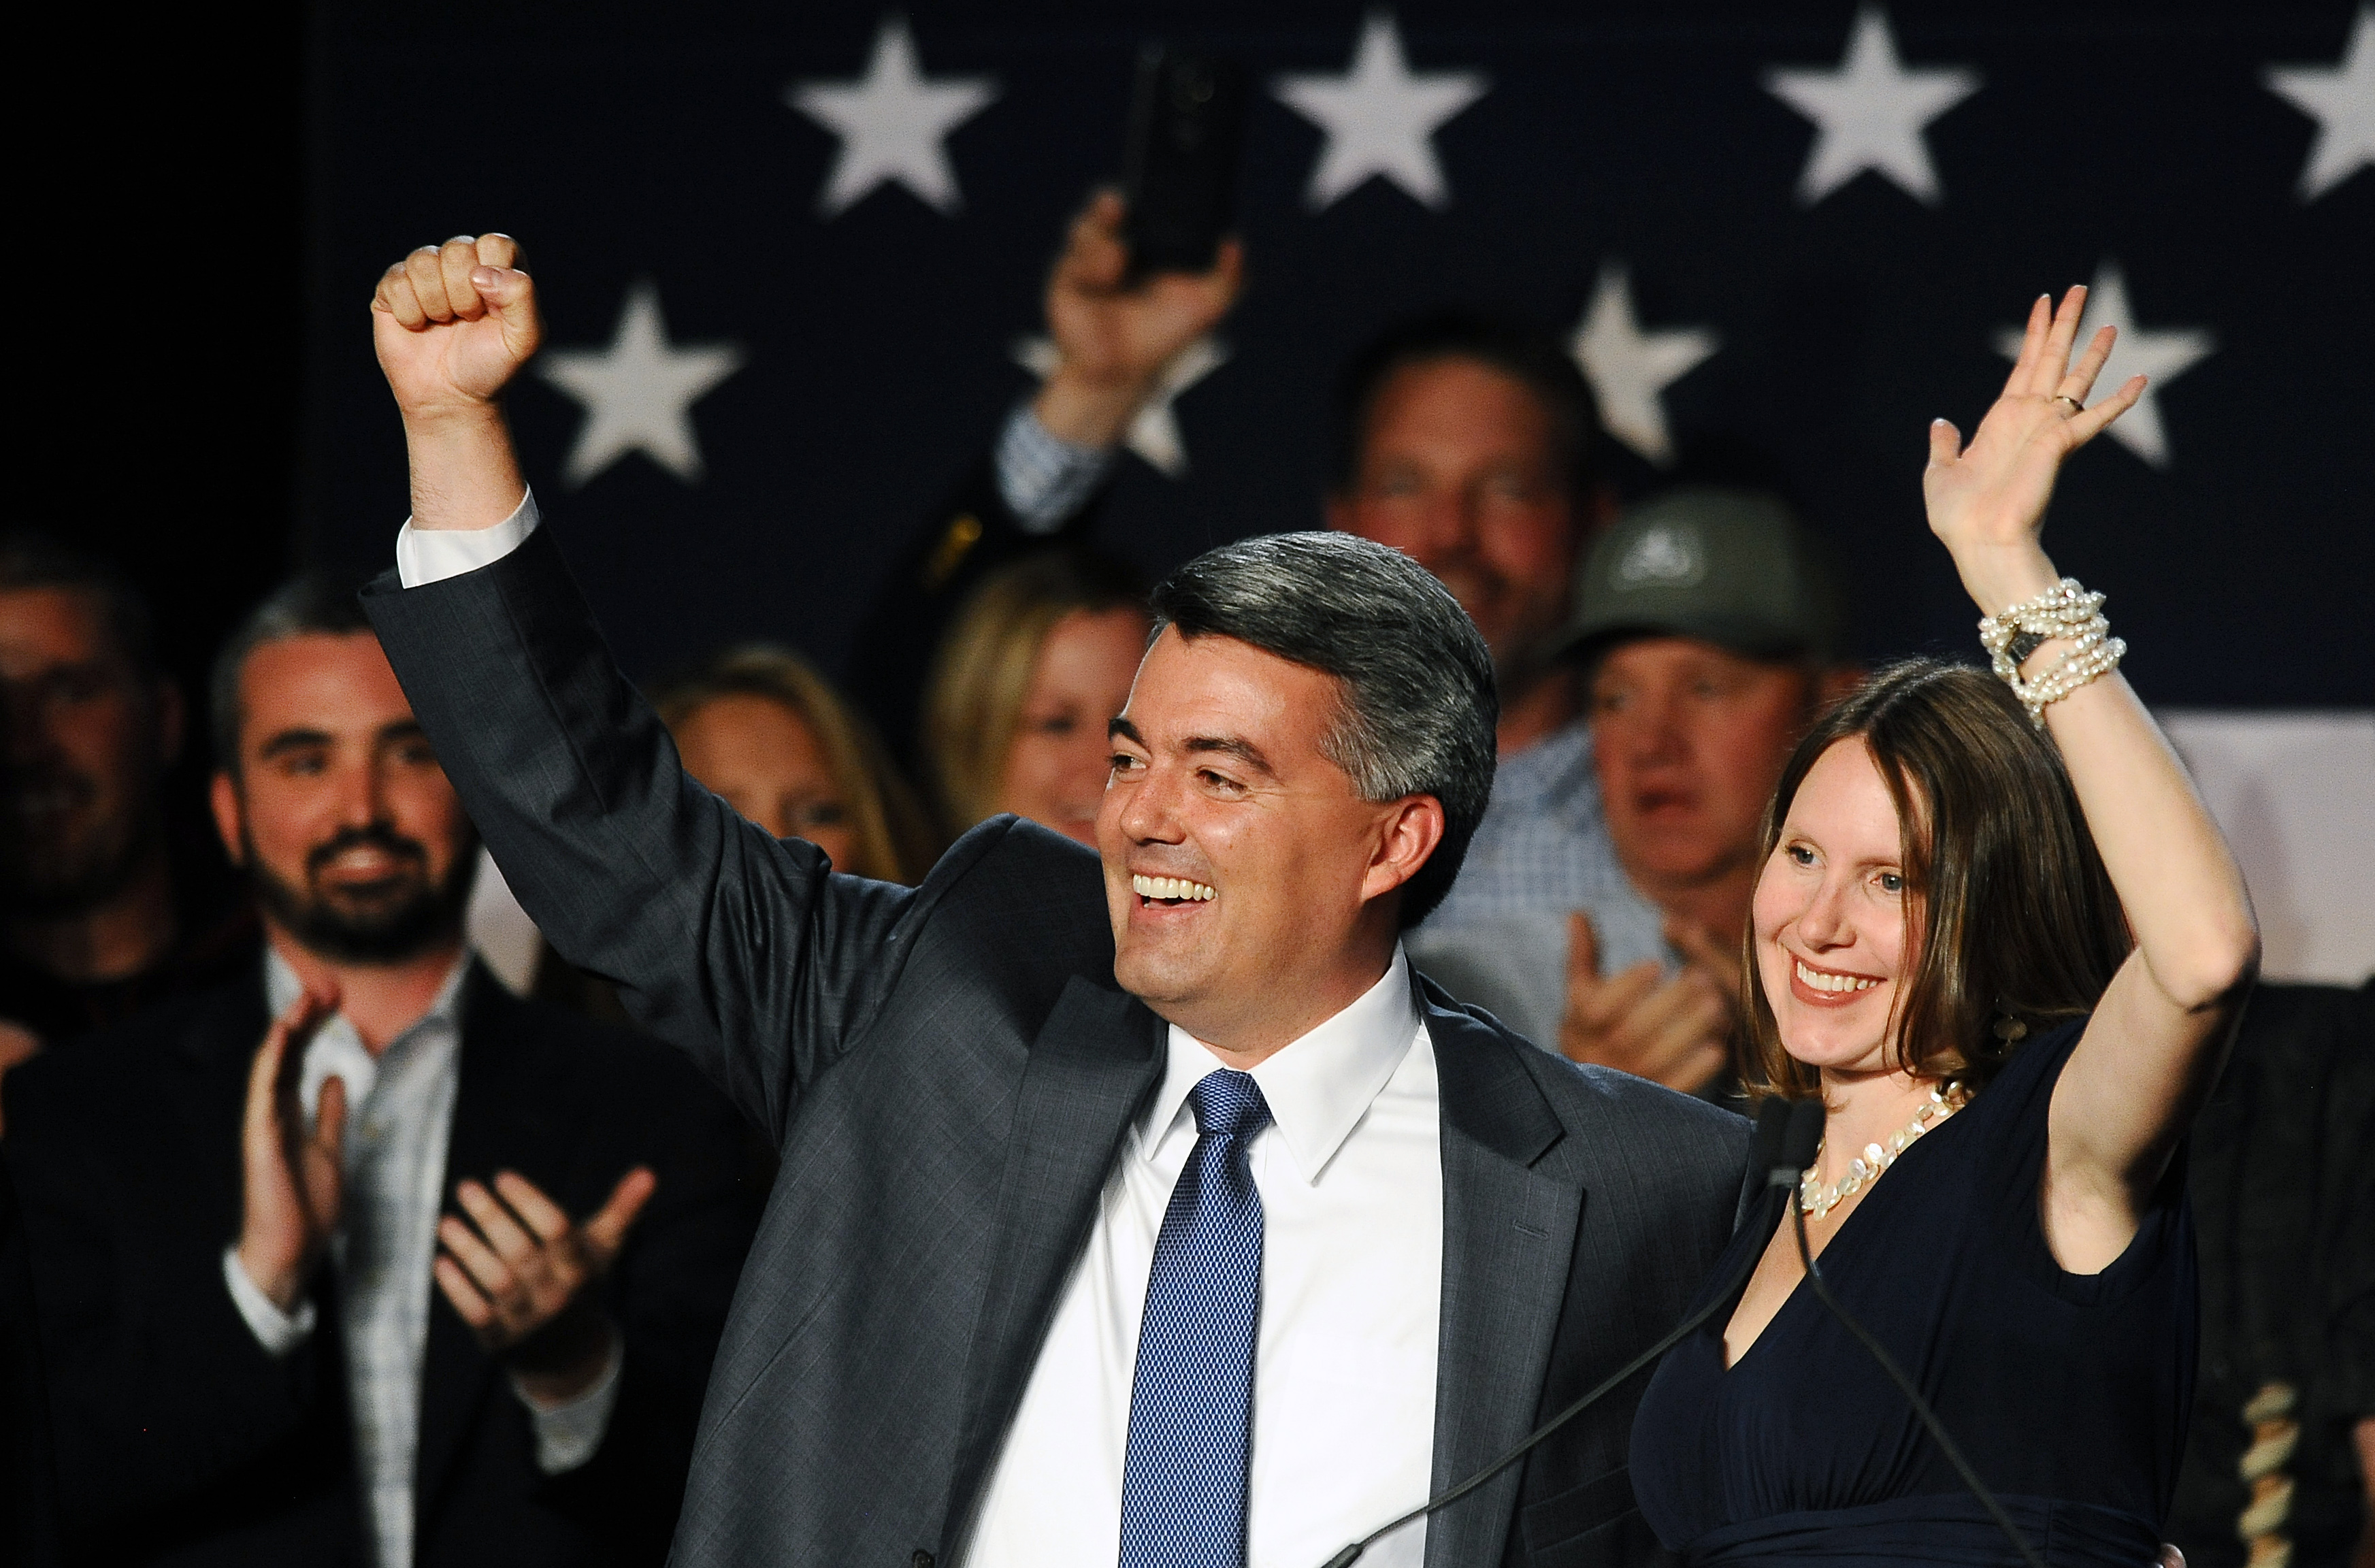 Photo: Cory Gardner wins Senate race (AP Photo)